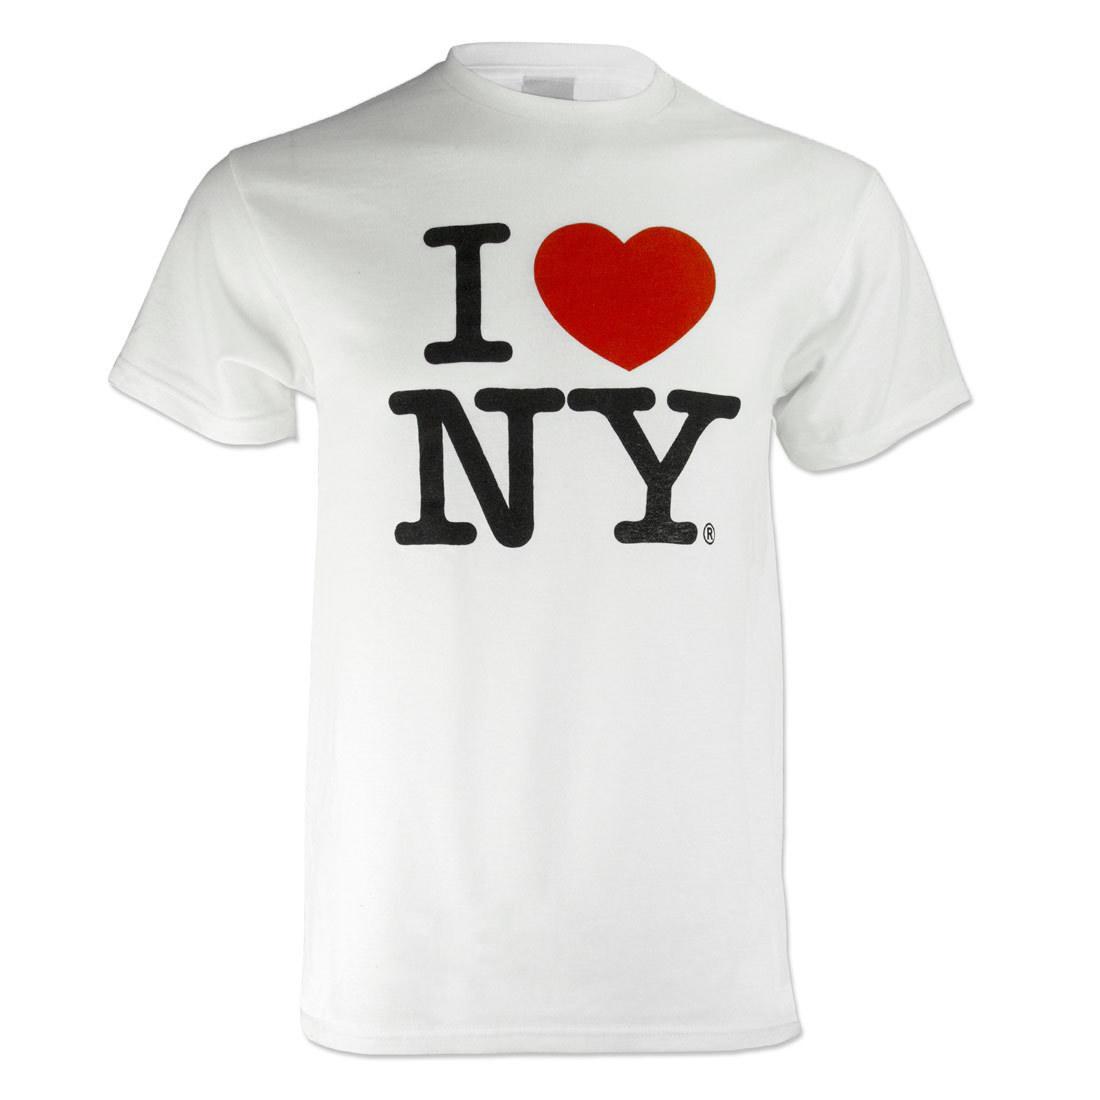 i love nyc - iconic t-shirts